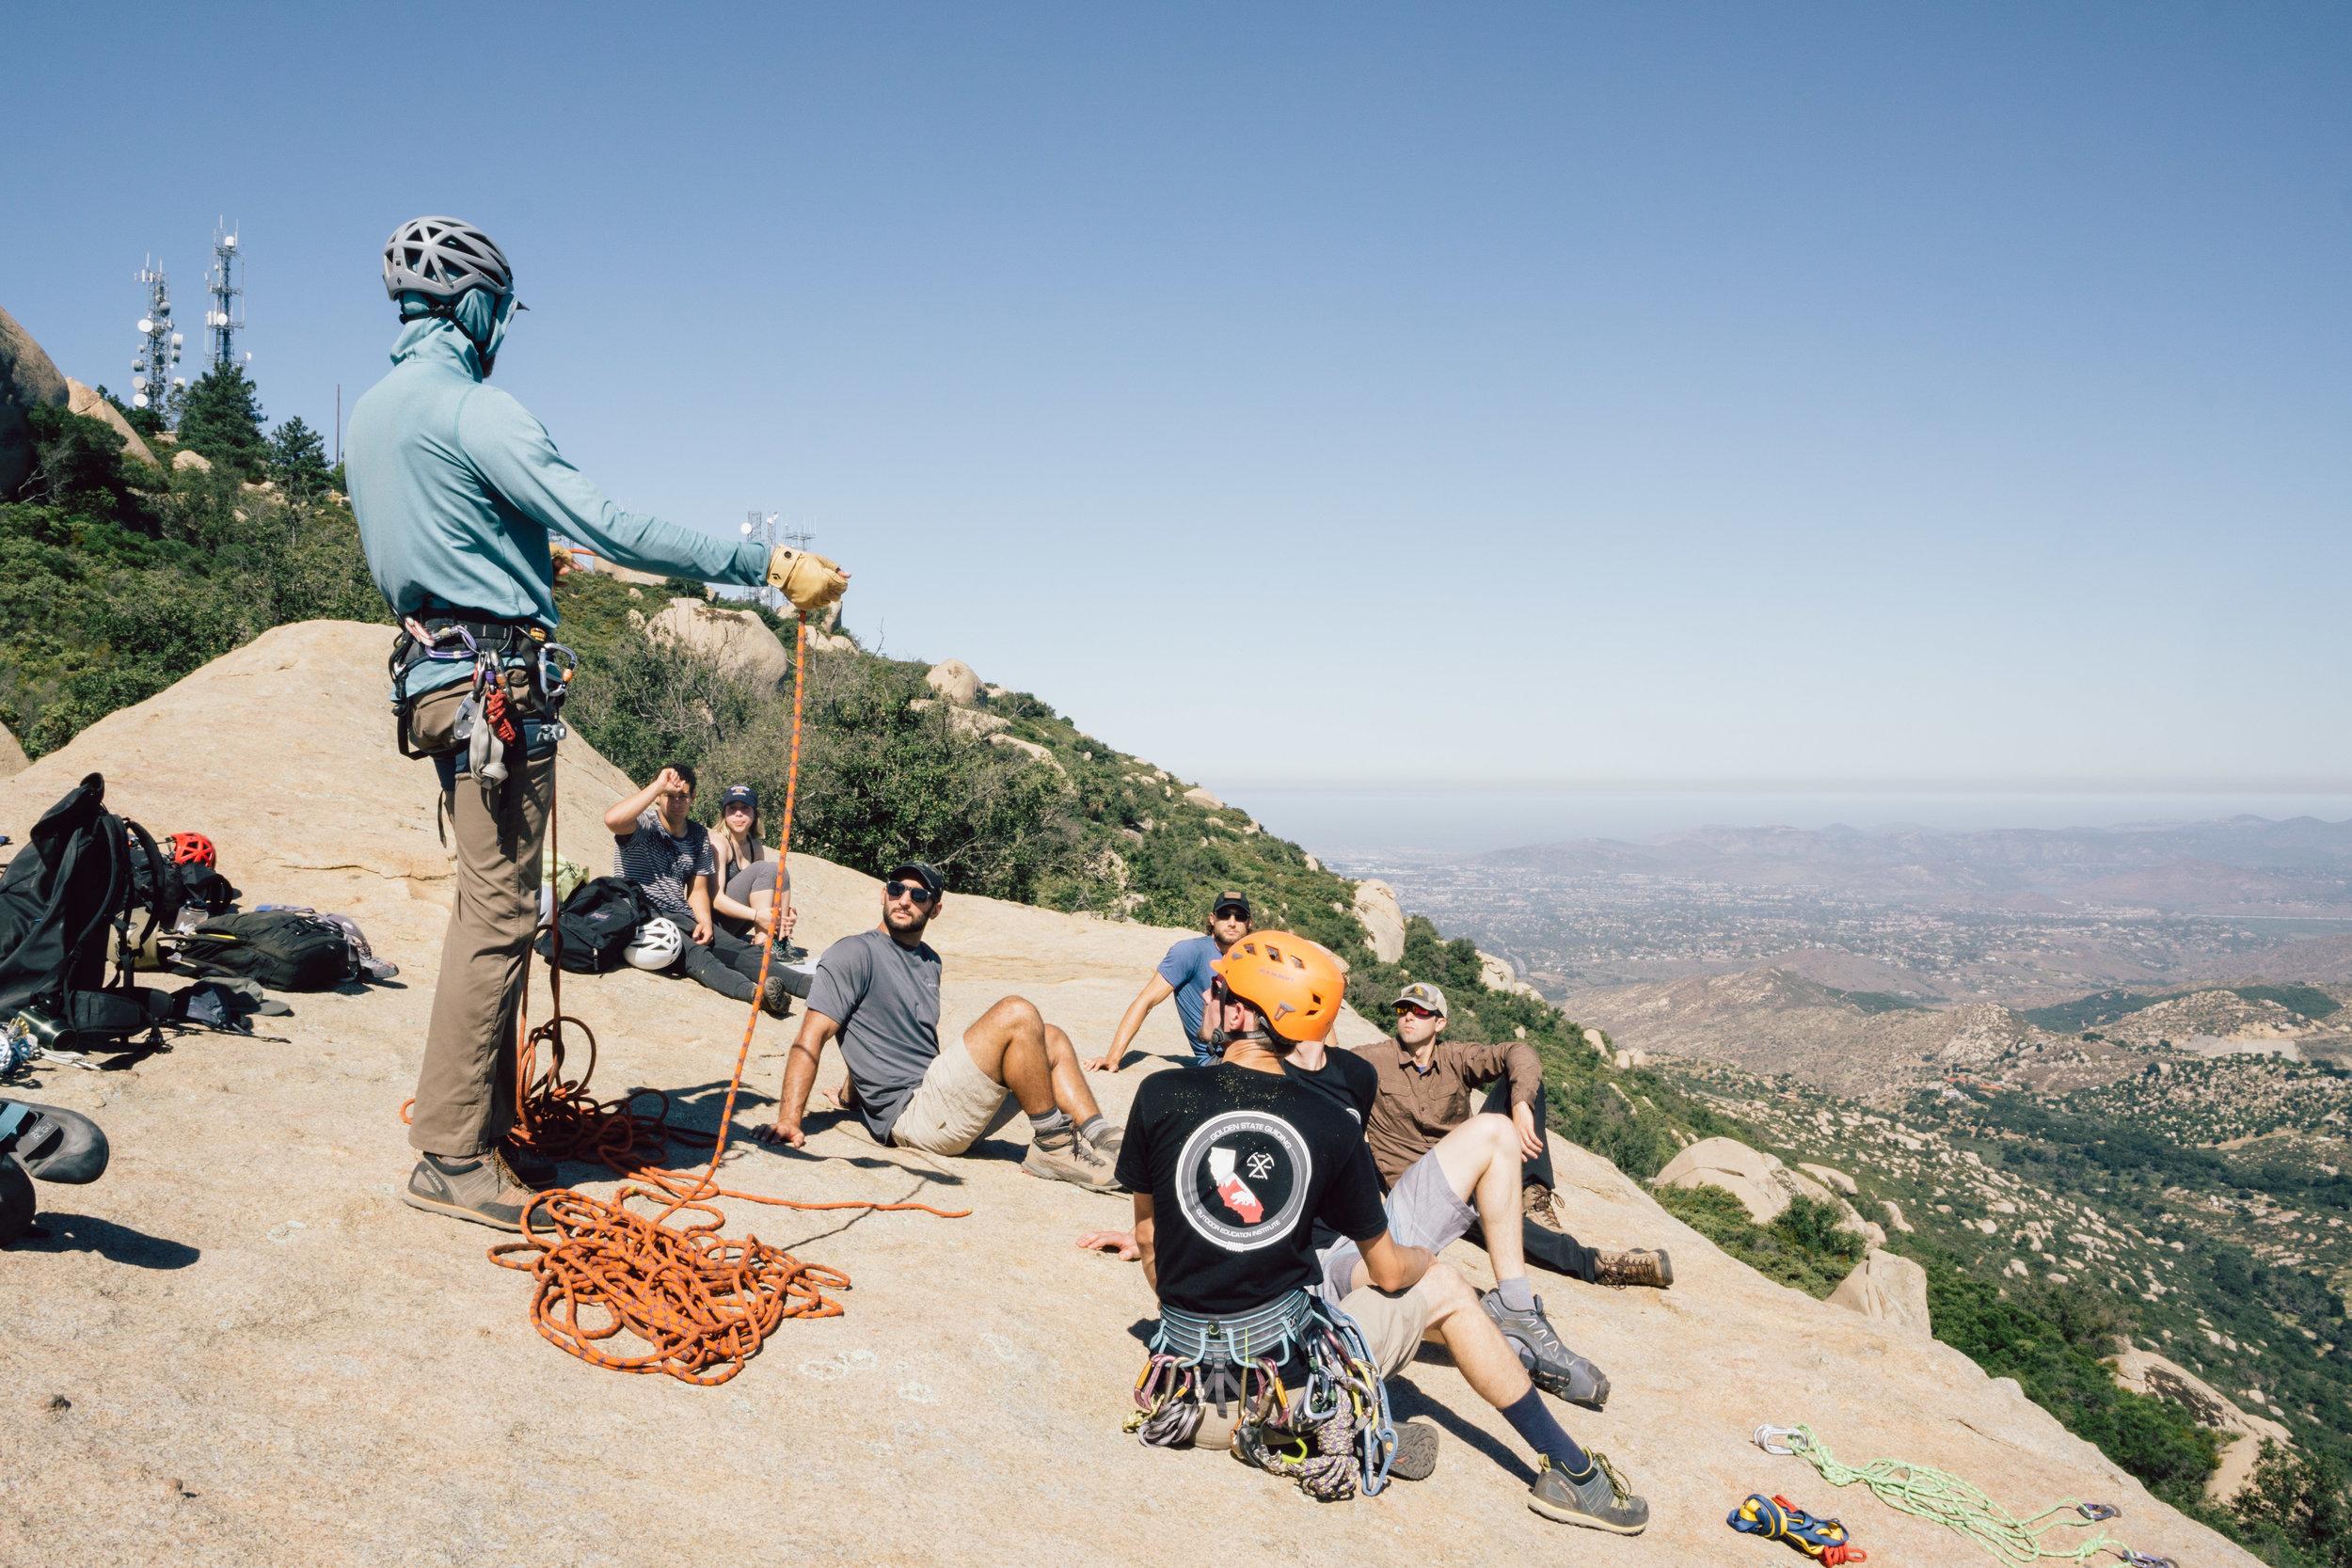 Golden State Guiding Mt. Woodson Rock Climbing Anchor Building